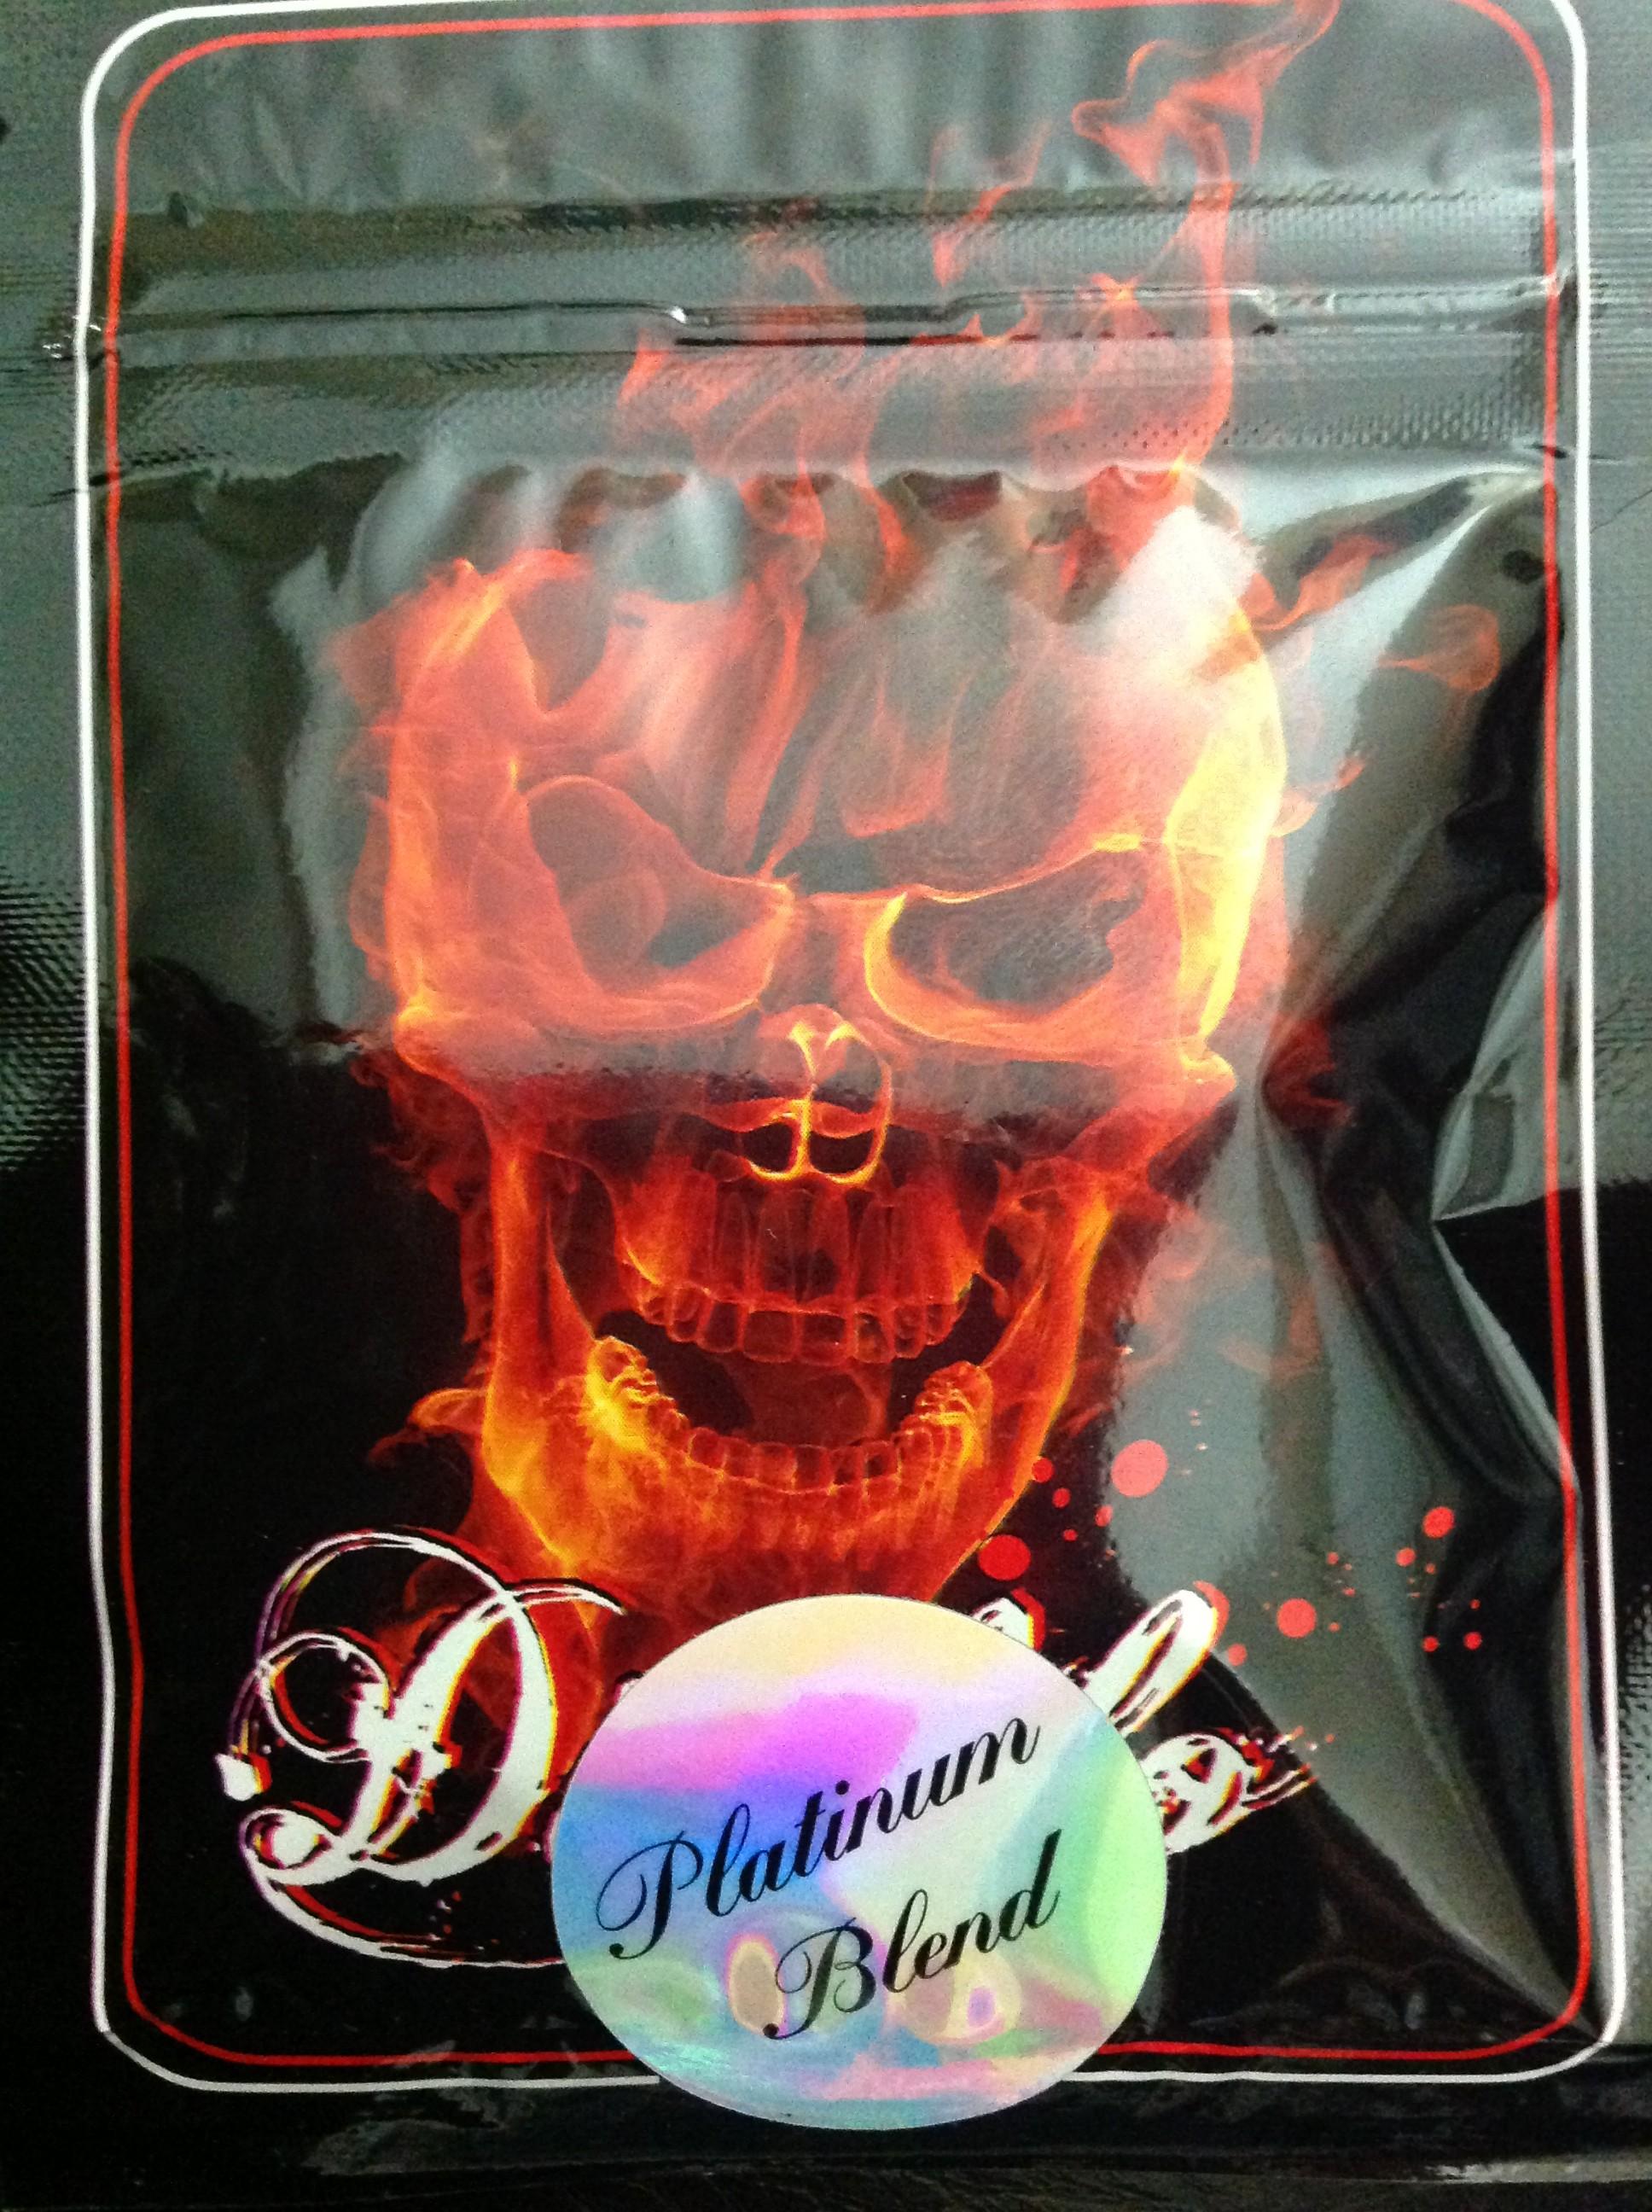 Diablo Flavored Jars Herbal Incense | Spice4fun.com